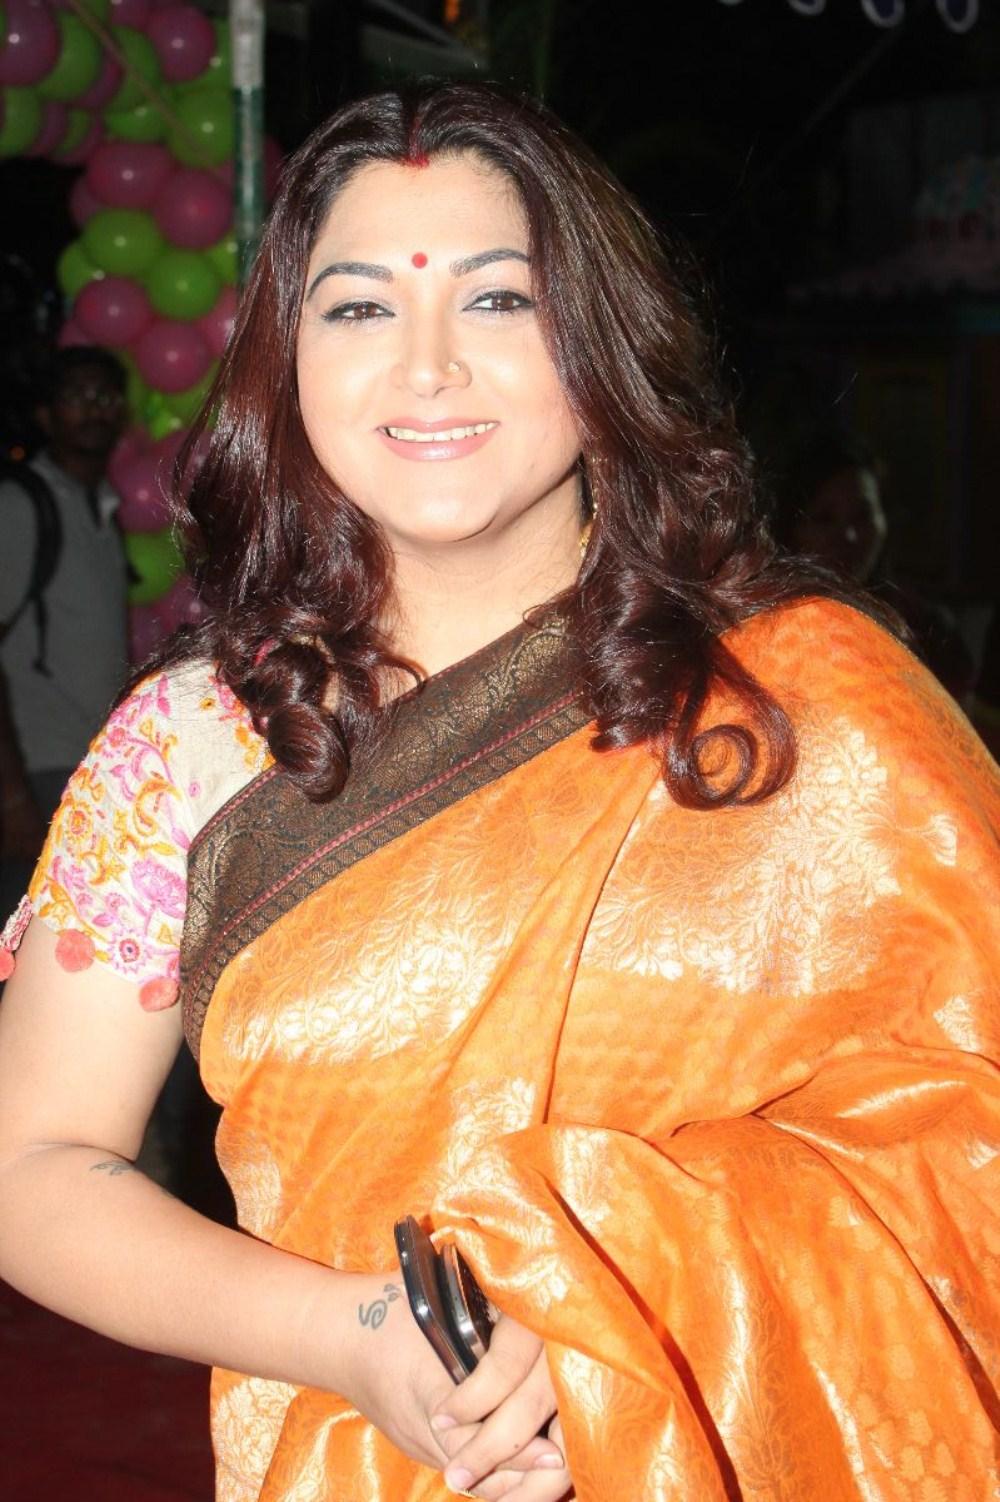 Kushboo Tamil Hot Cheap newstillsindia: kushboo launches green trends salon photos (no